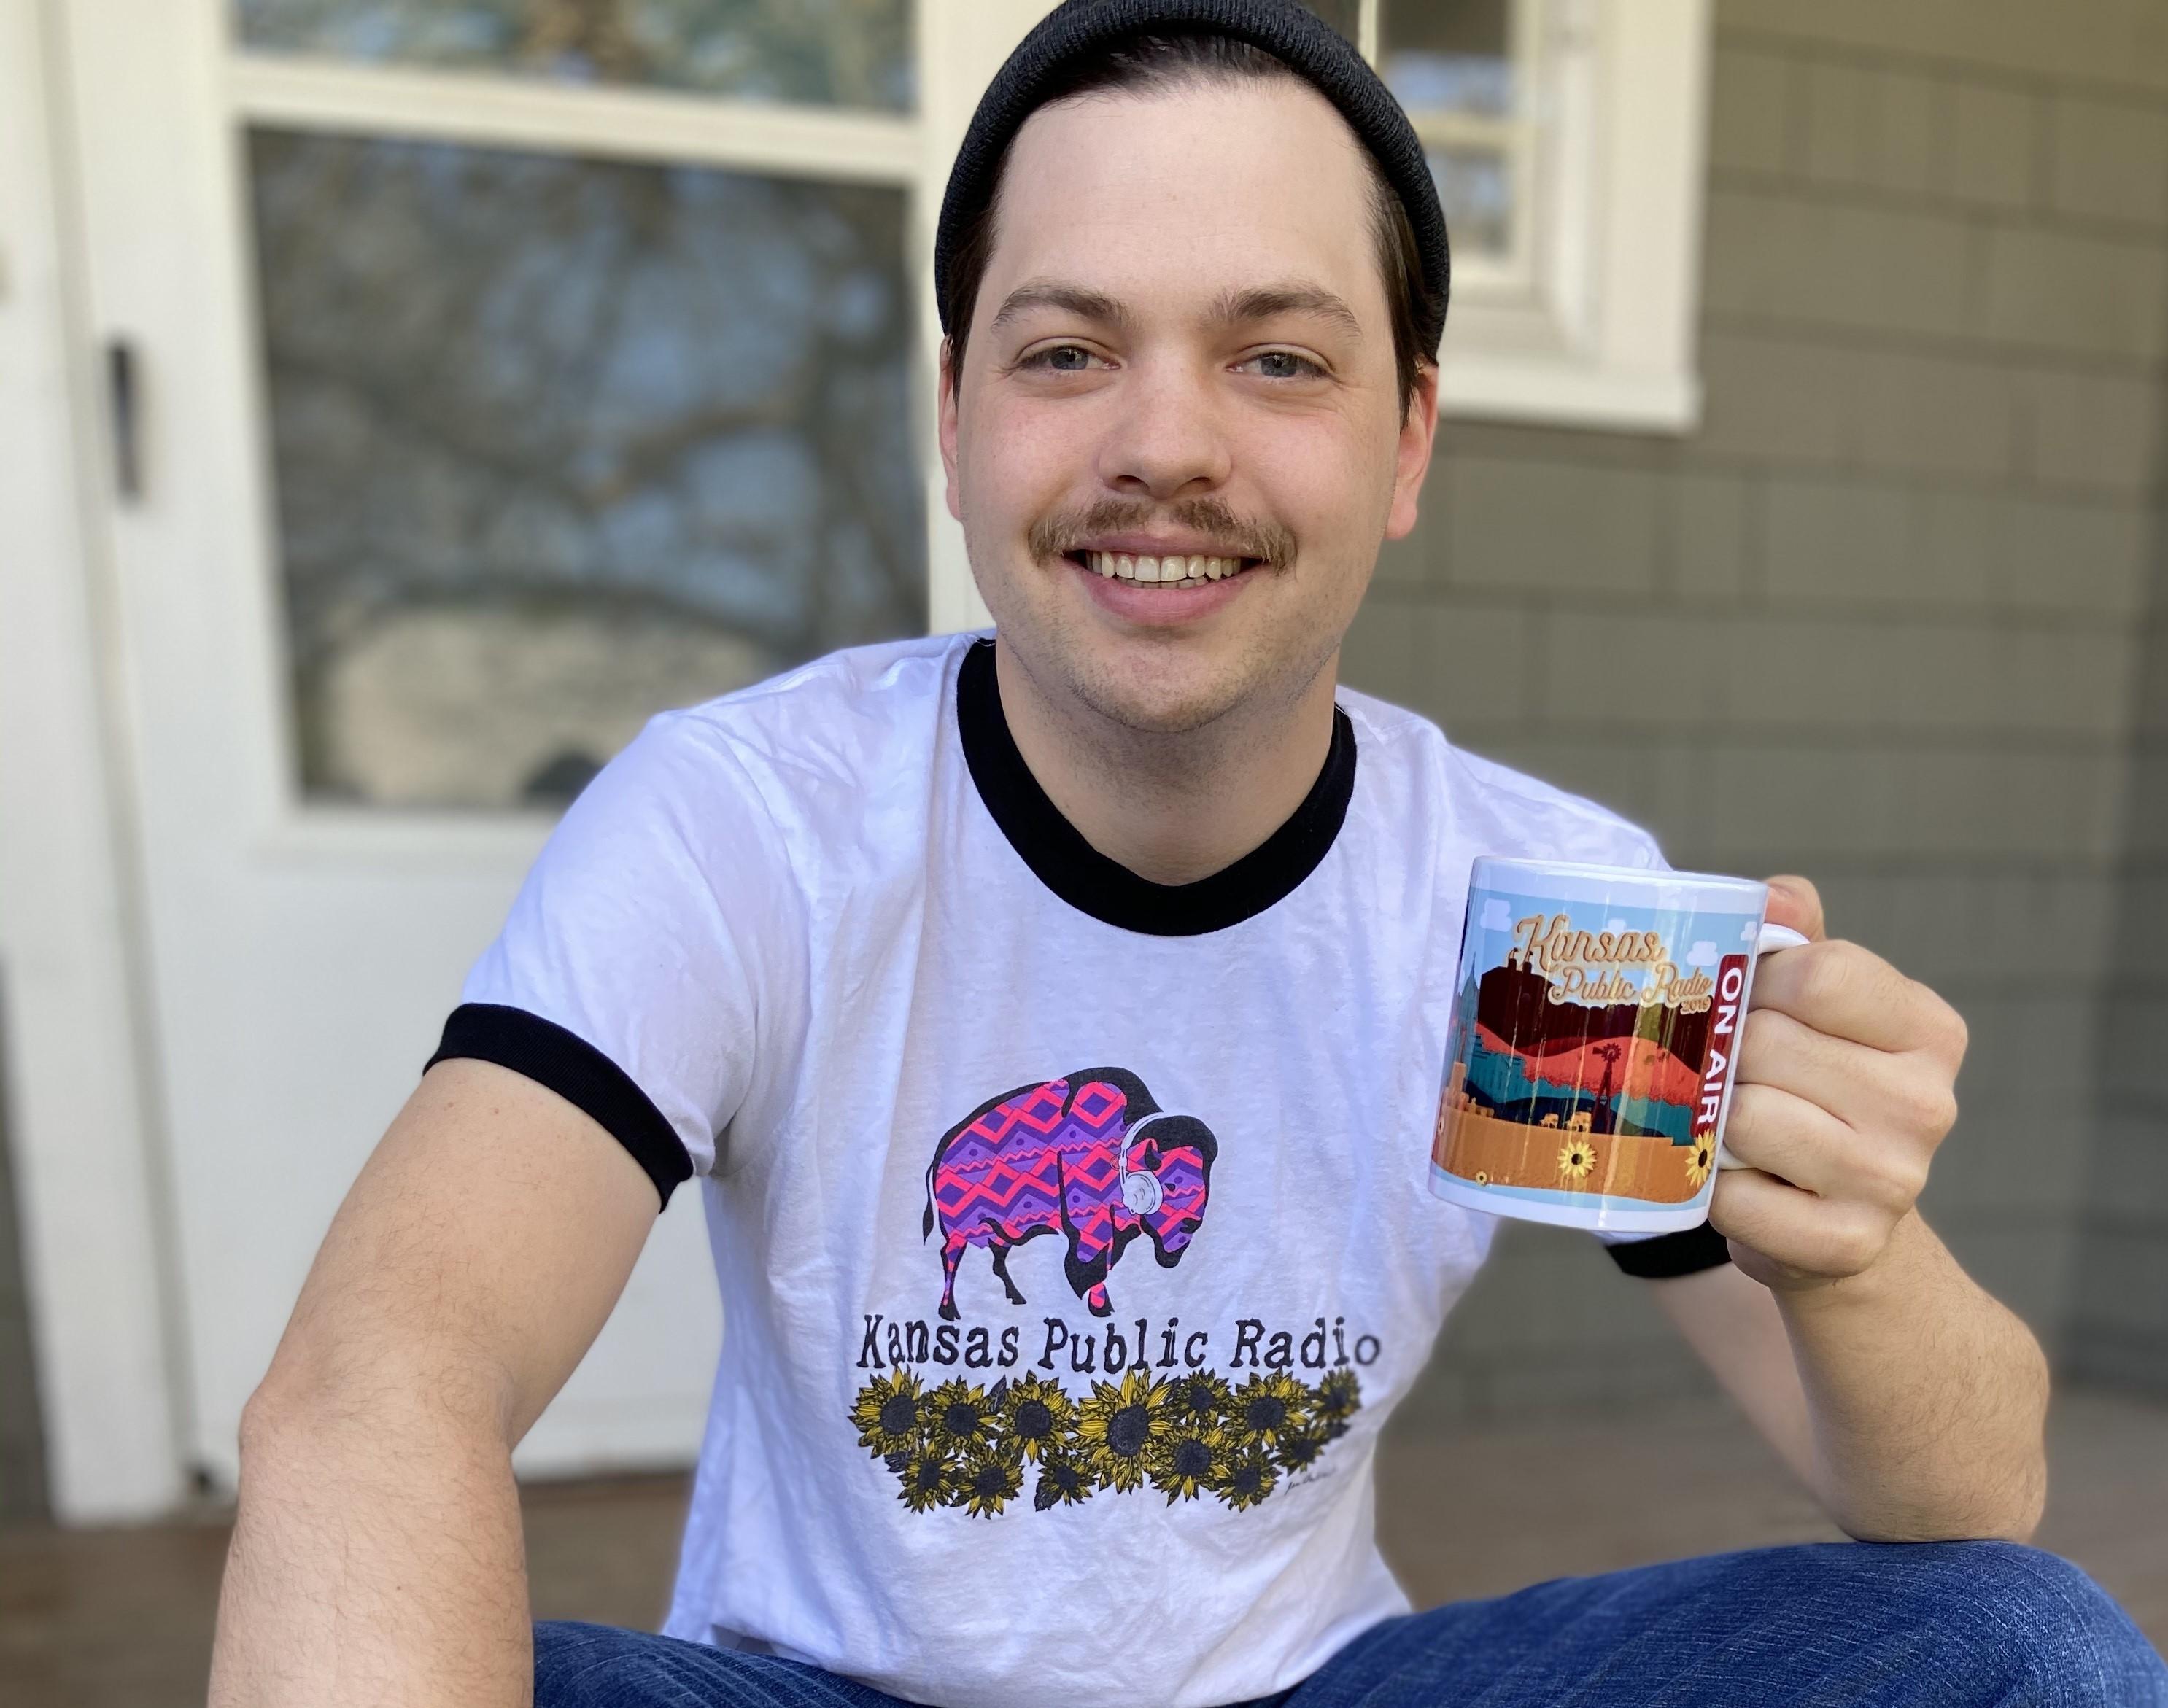 Kansas Public Radio T-Shirt Prize